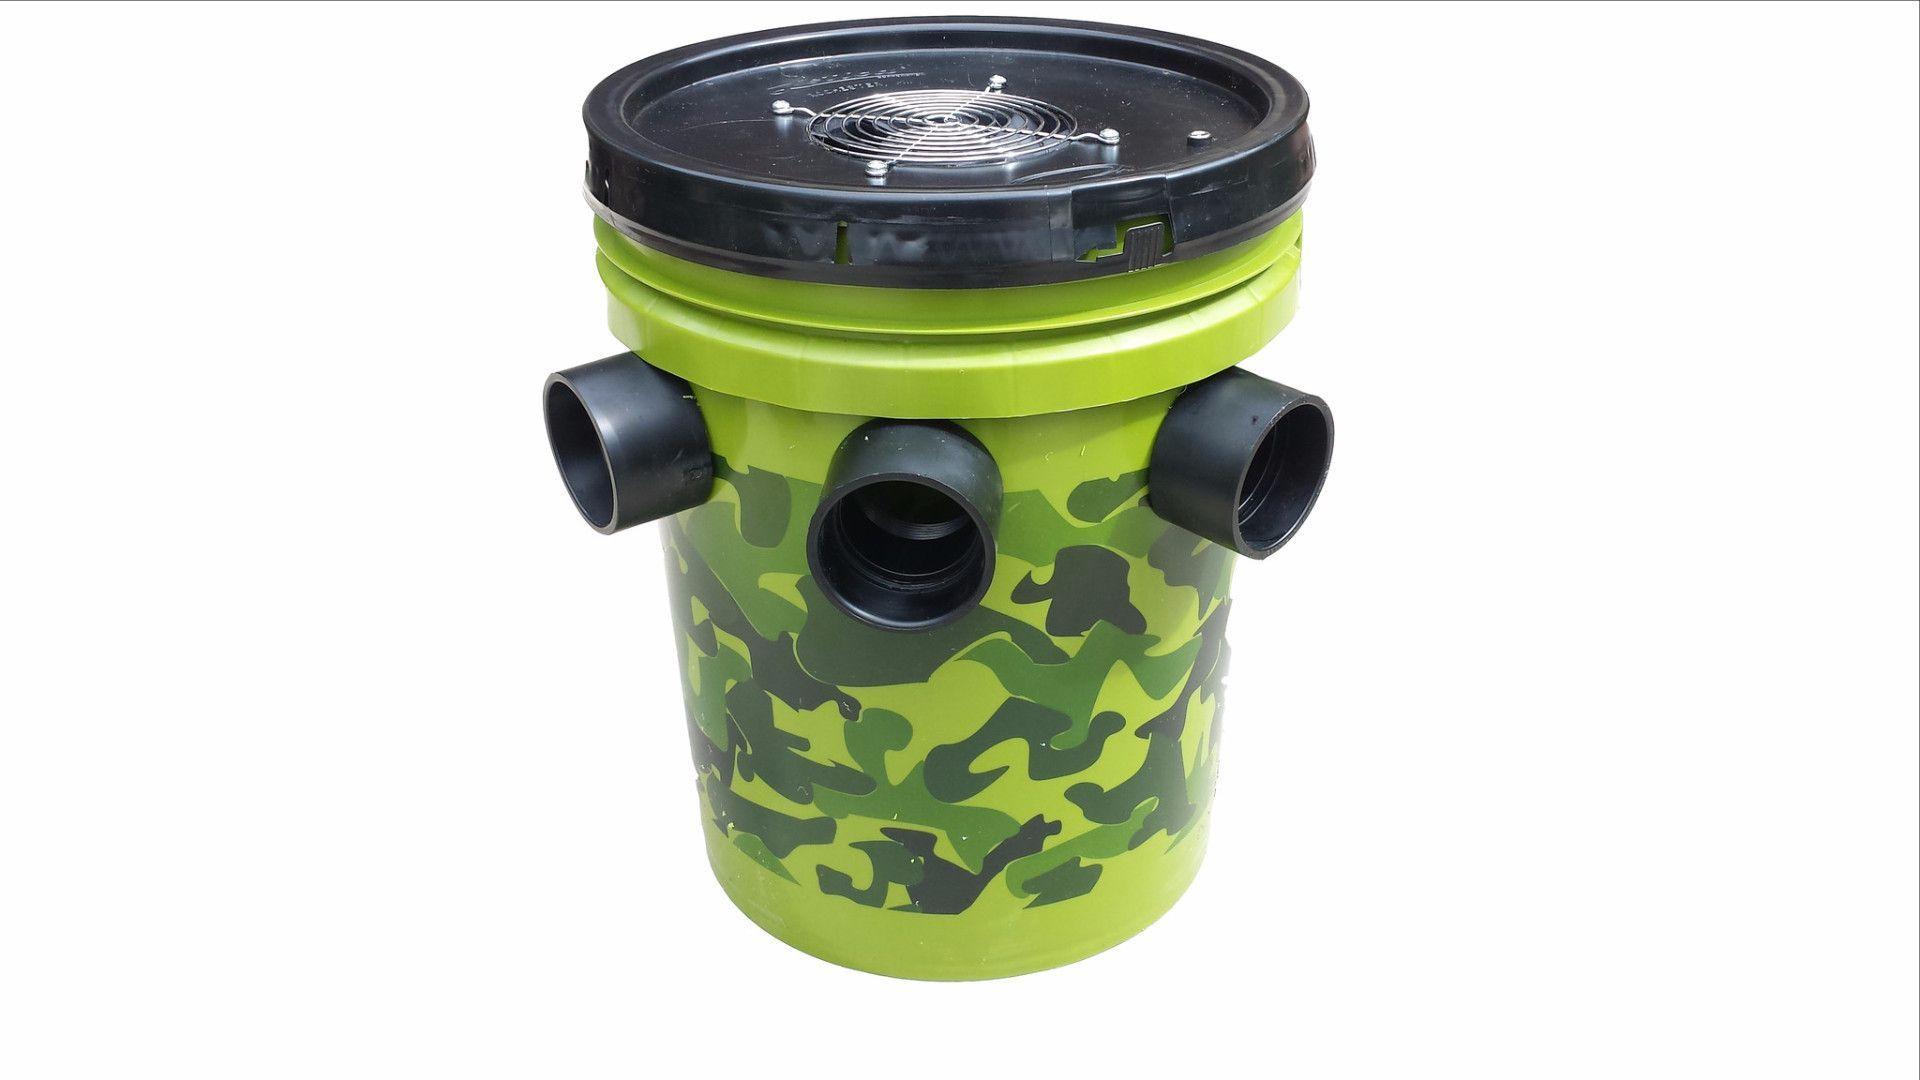 Ice Models Bucket air conditioner, Pickle jars, Mugs